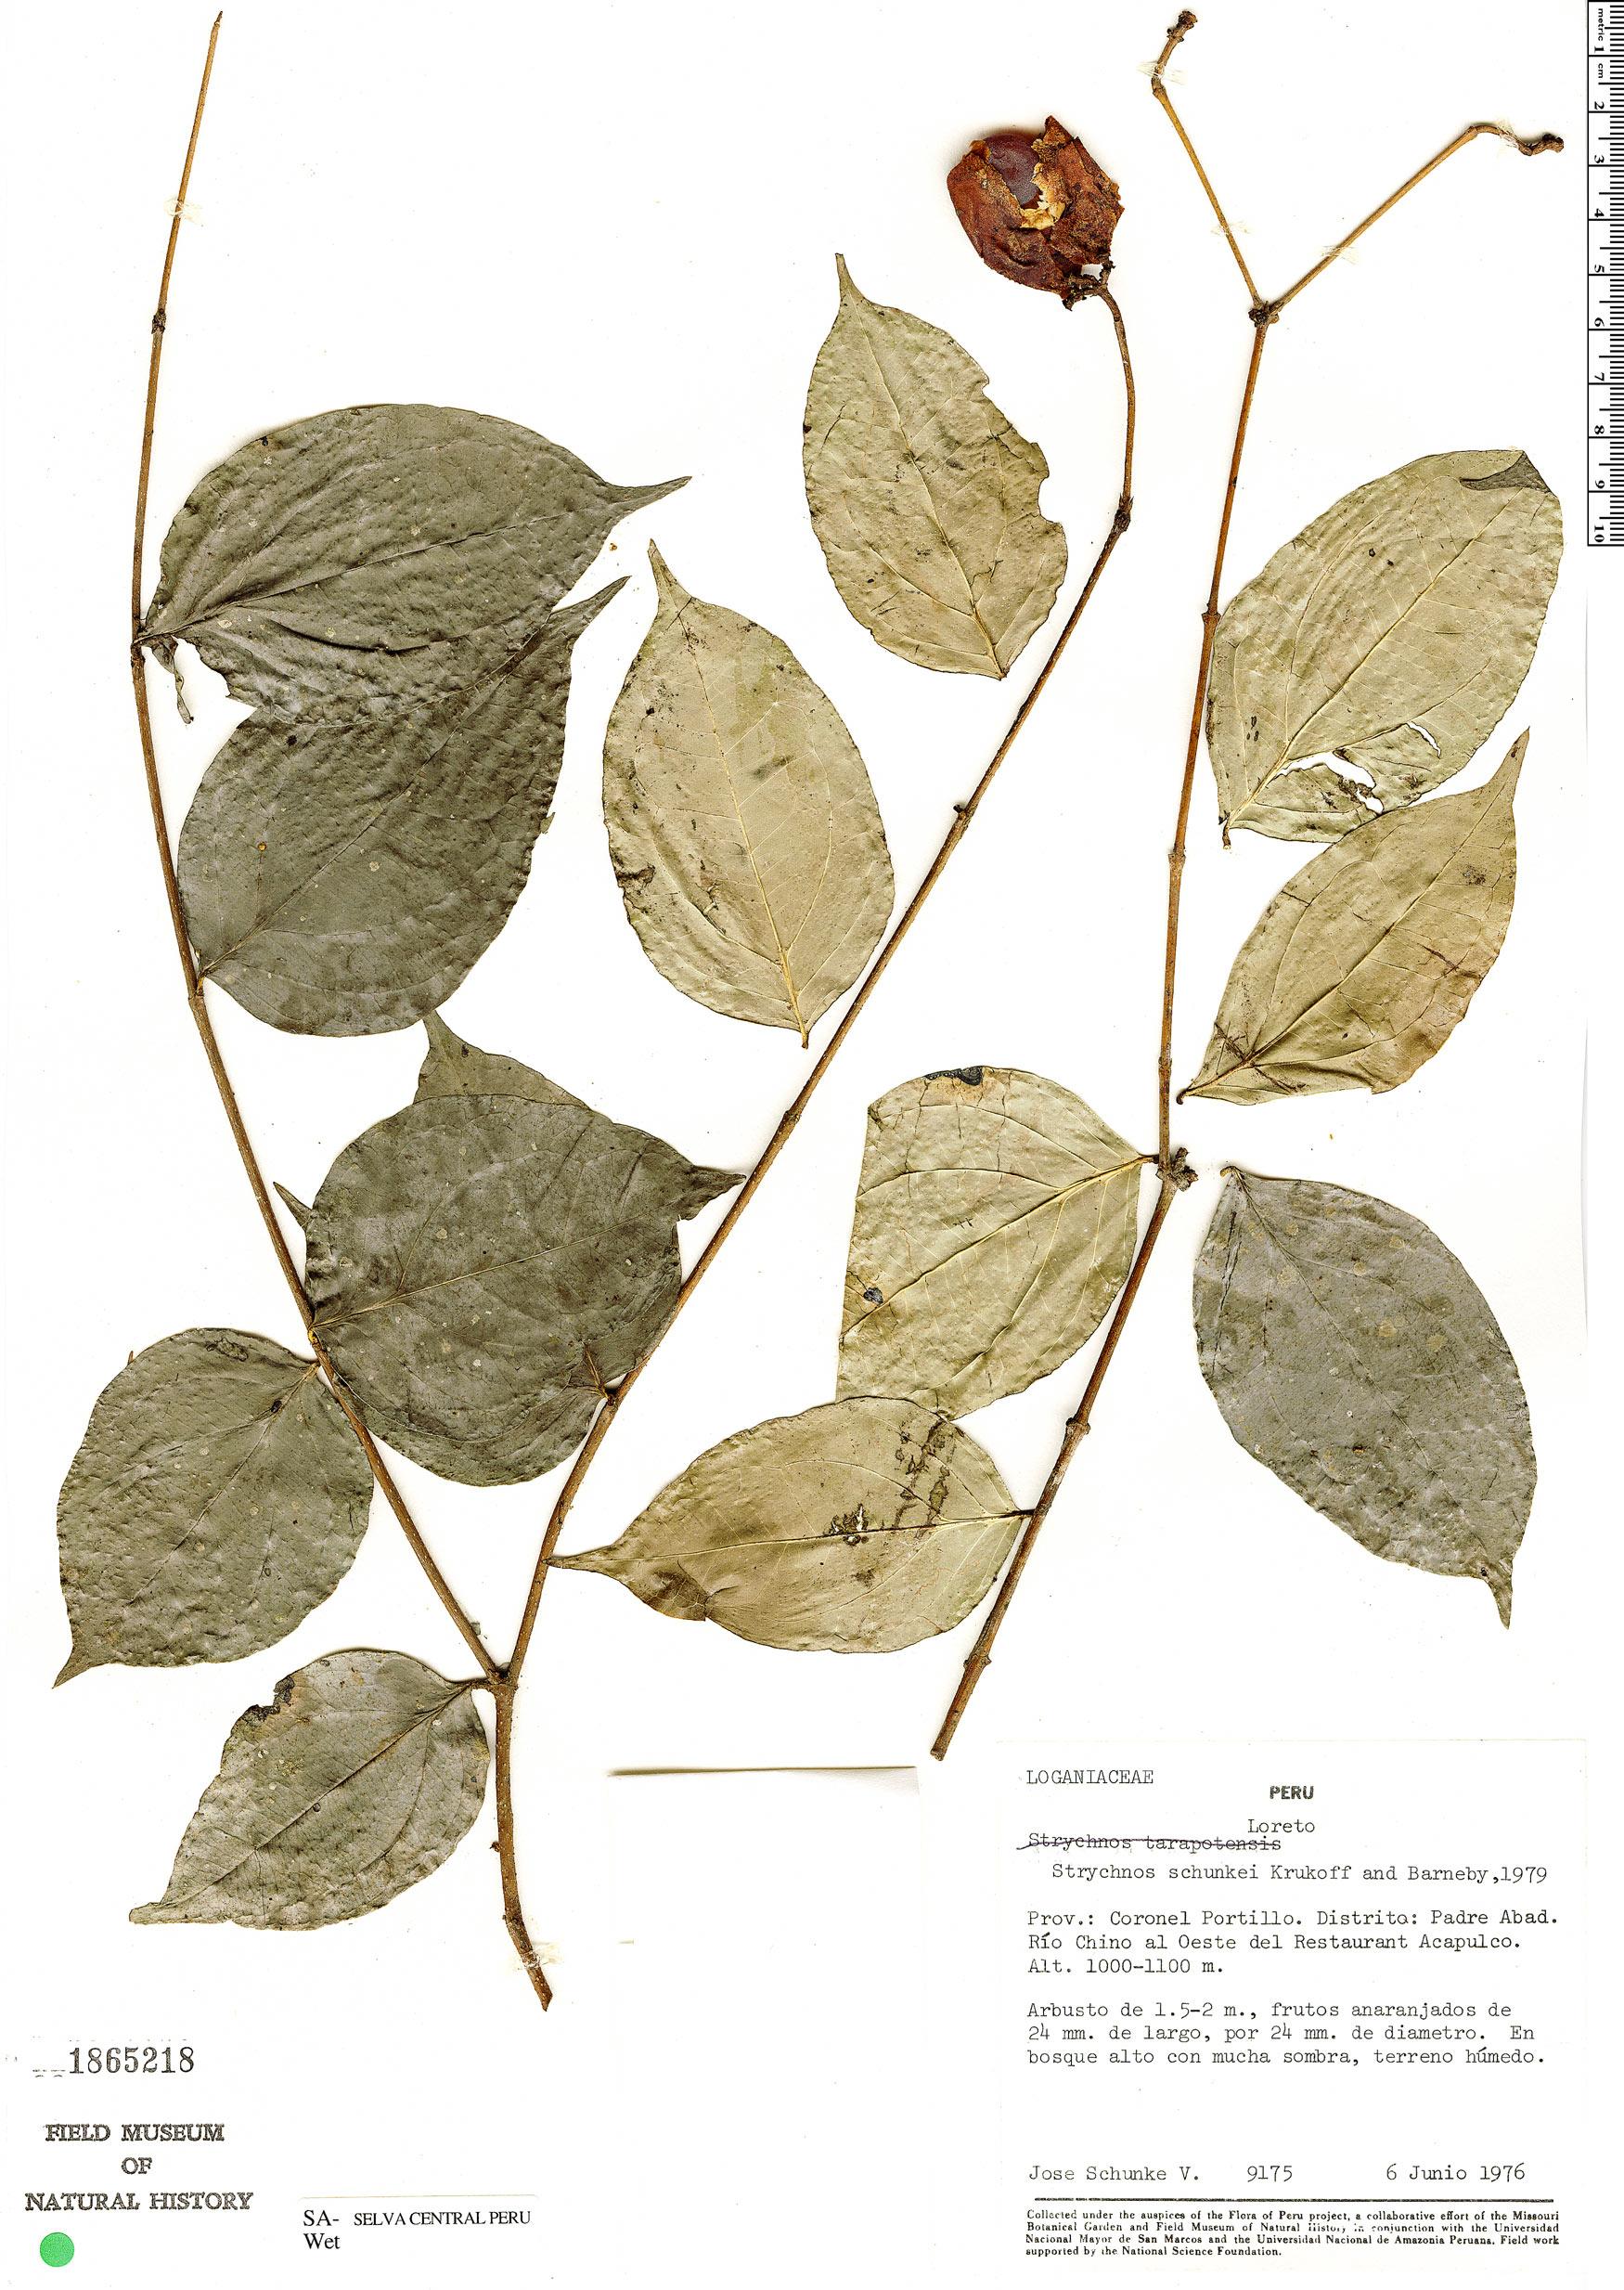 Espécimen: Strychnos schunkei